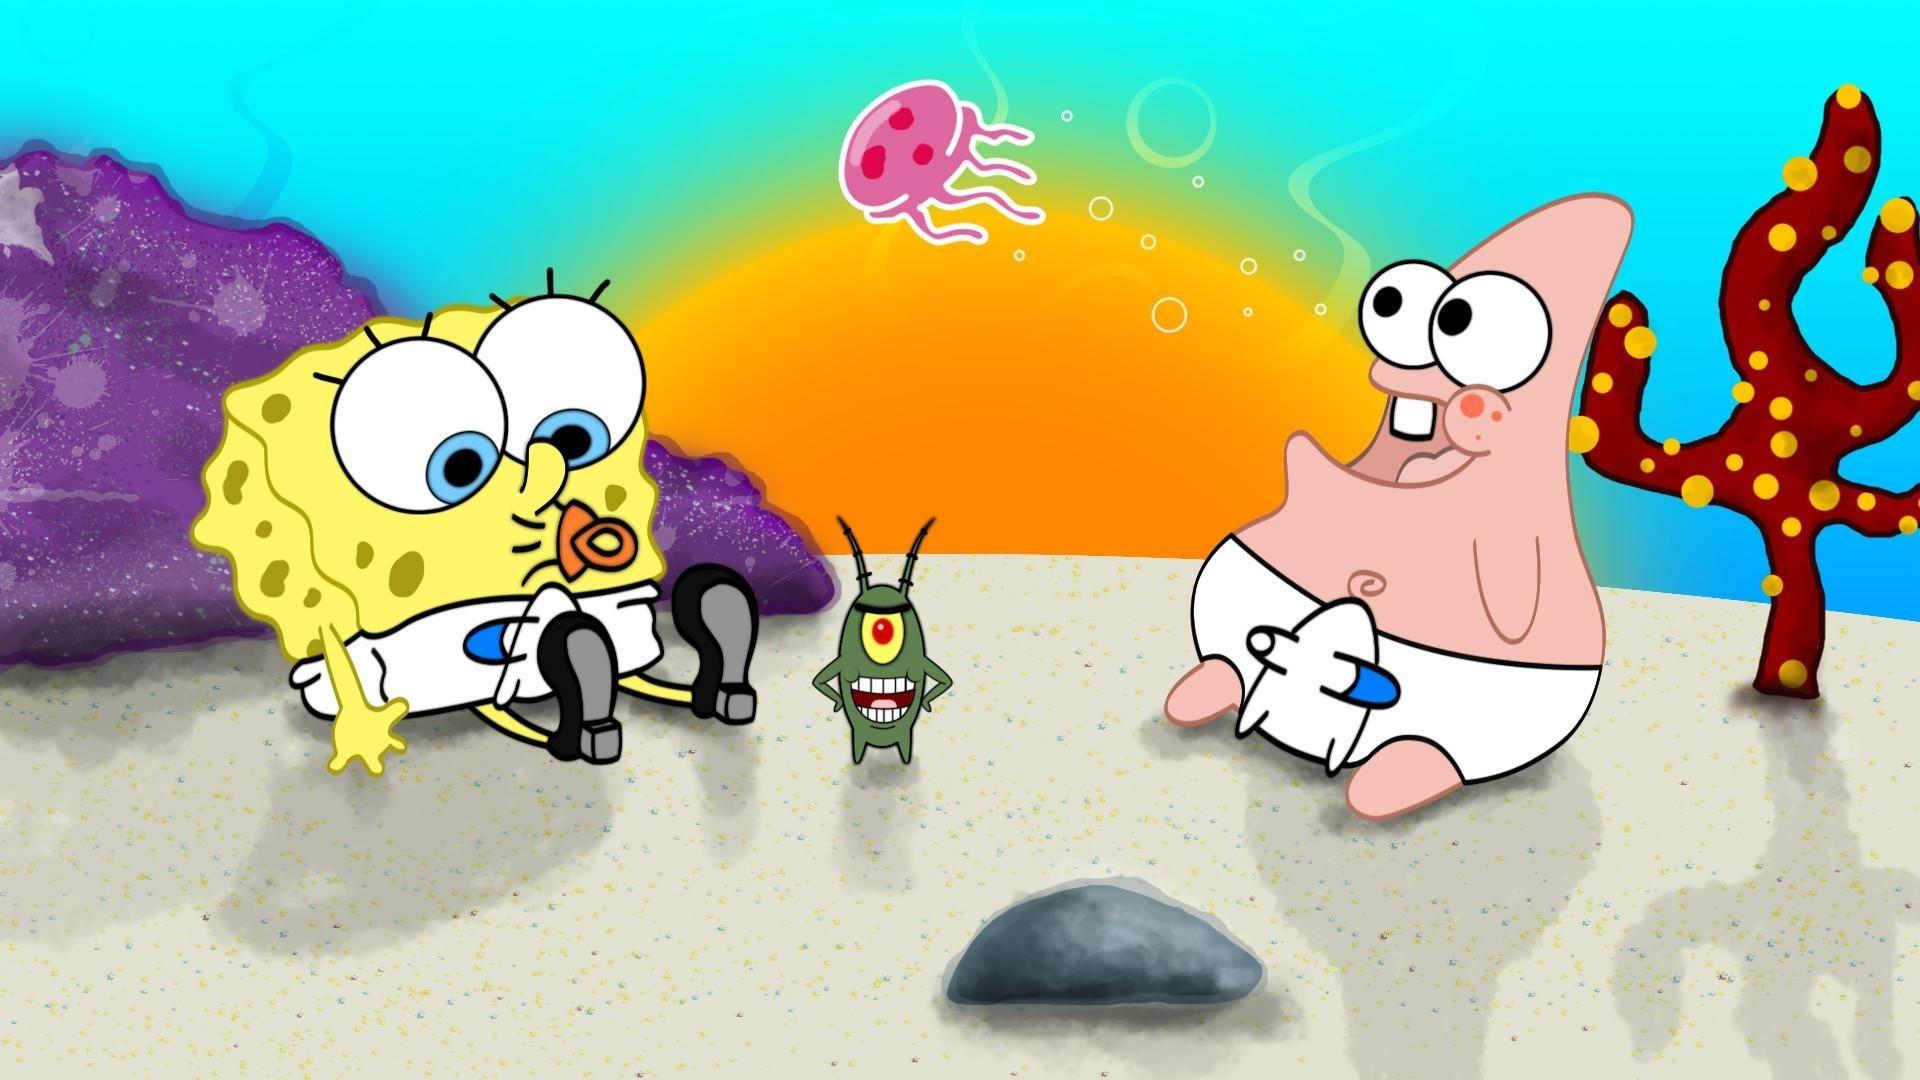 Aesthetic Spongebob Wallpaper and Background